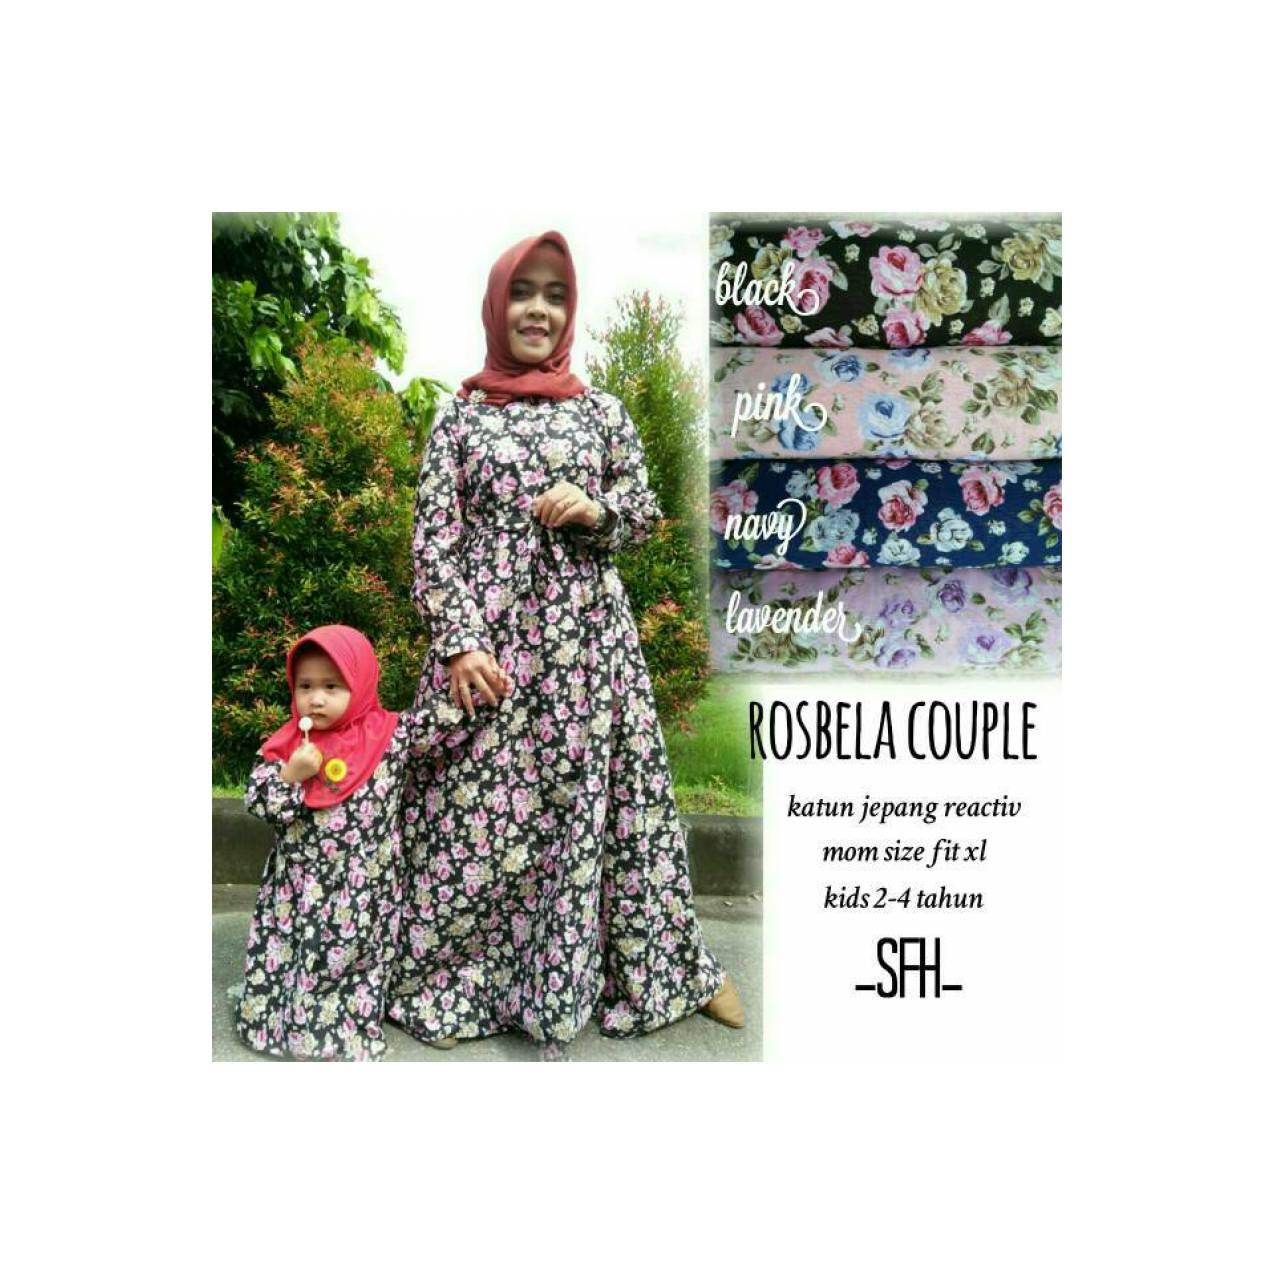 Gamis dress baju muslim murah muslimah couple sarimbit ibu anak kids